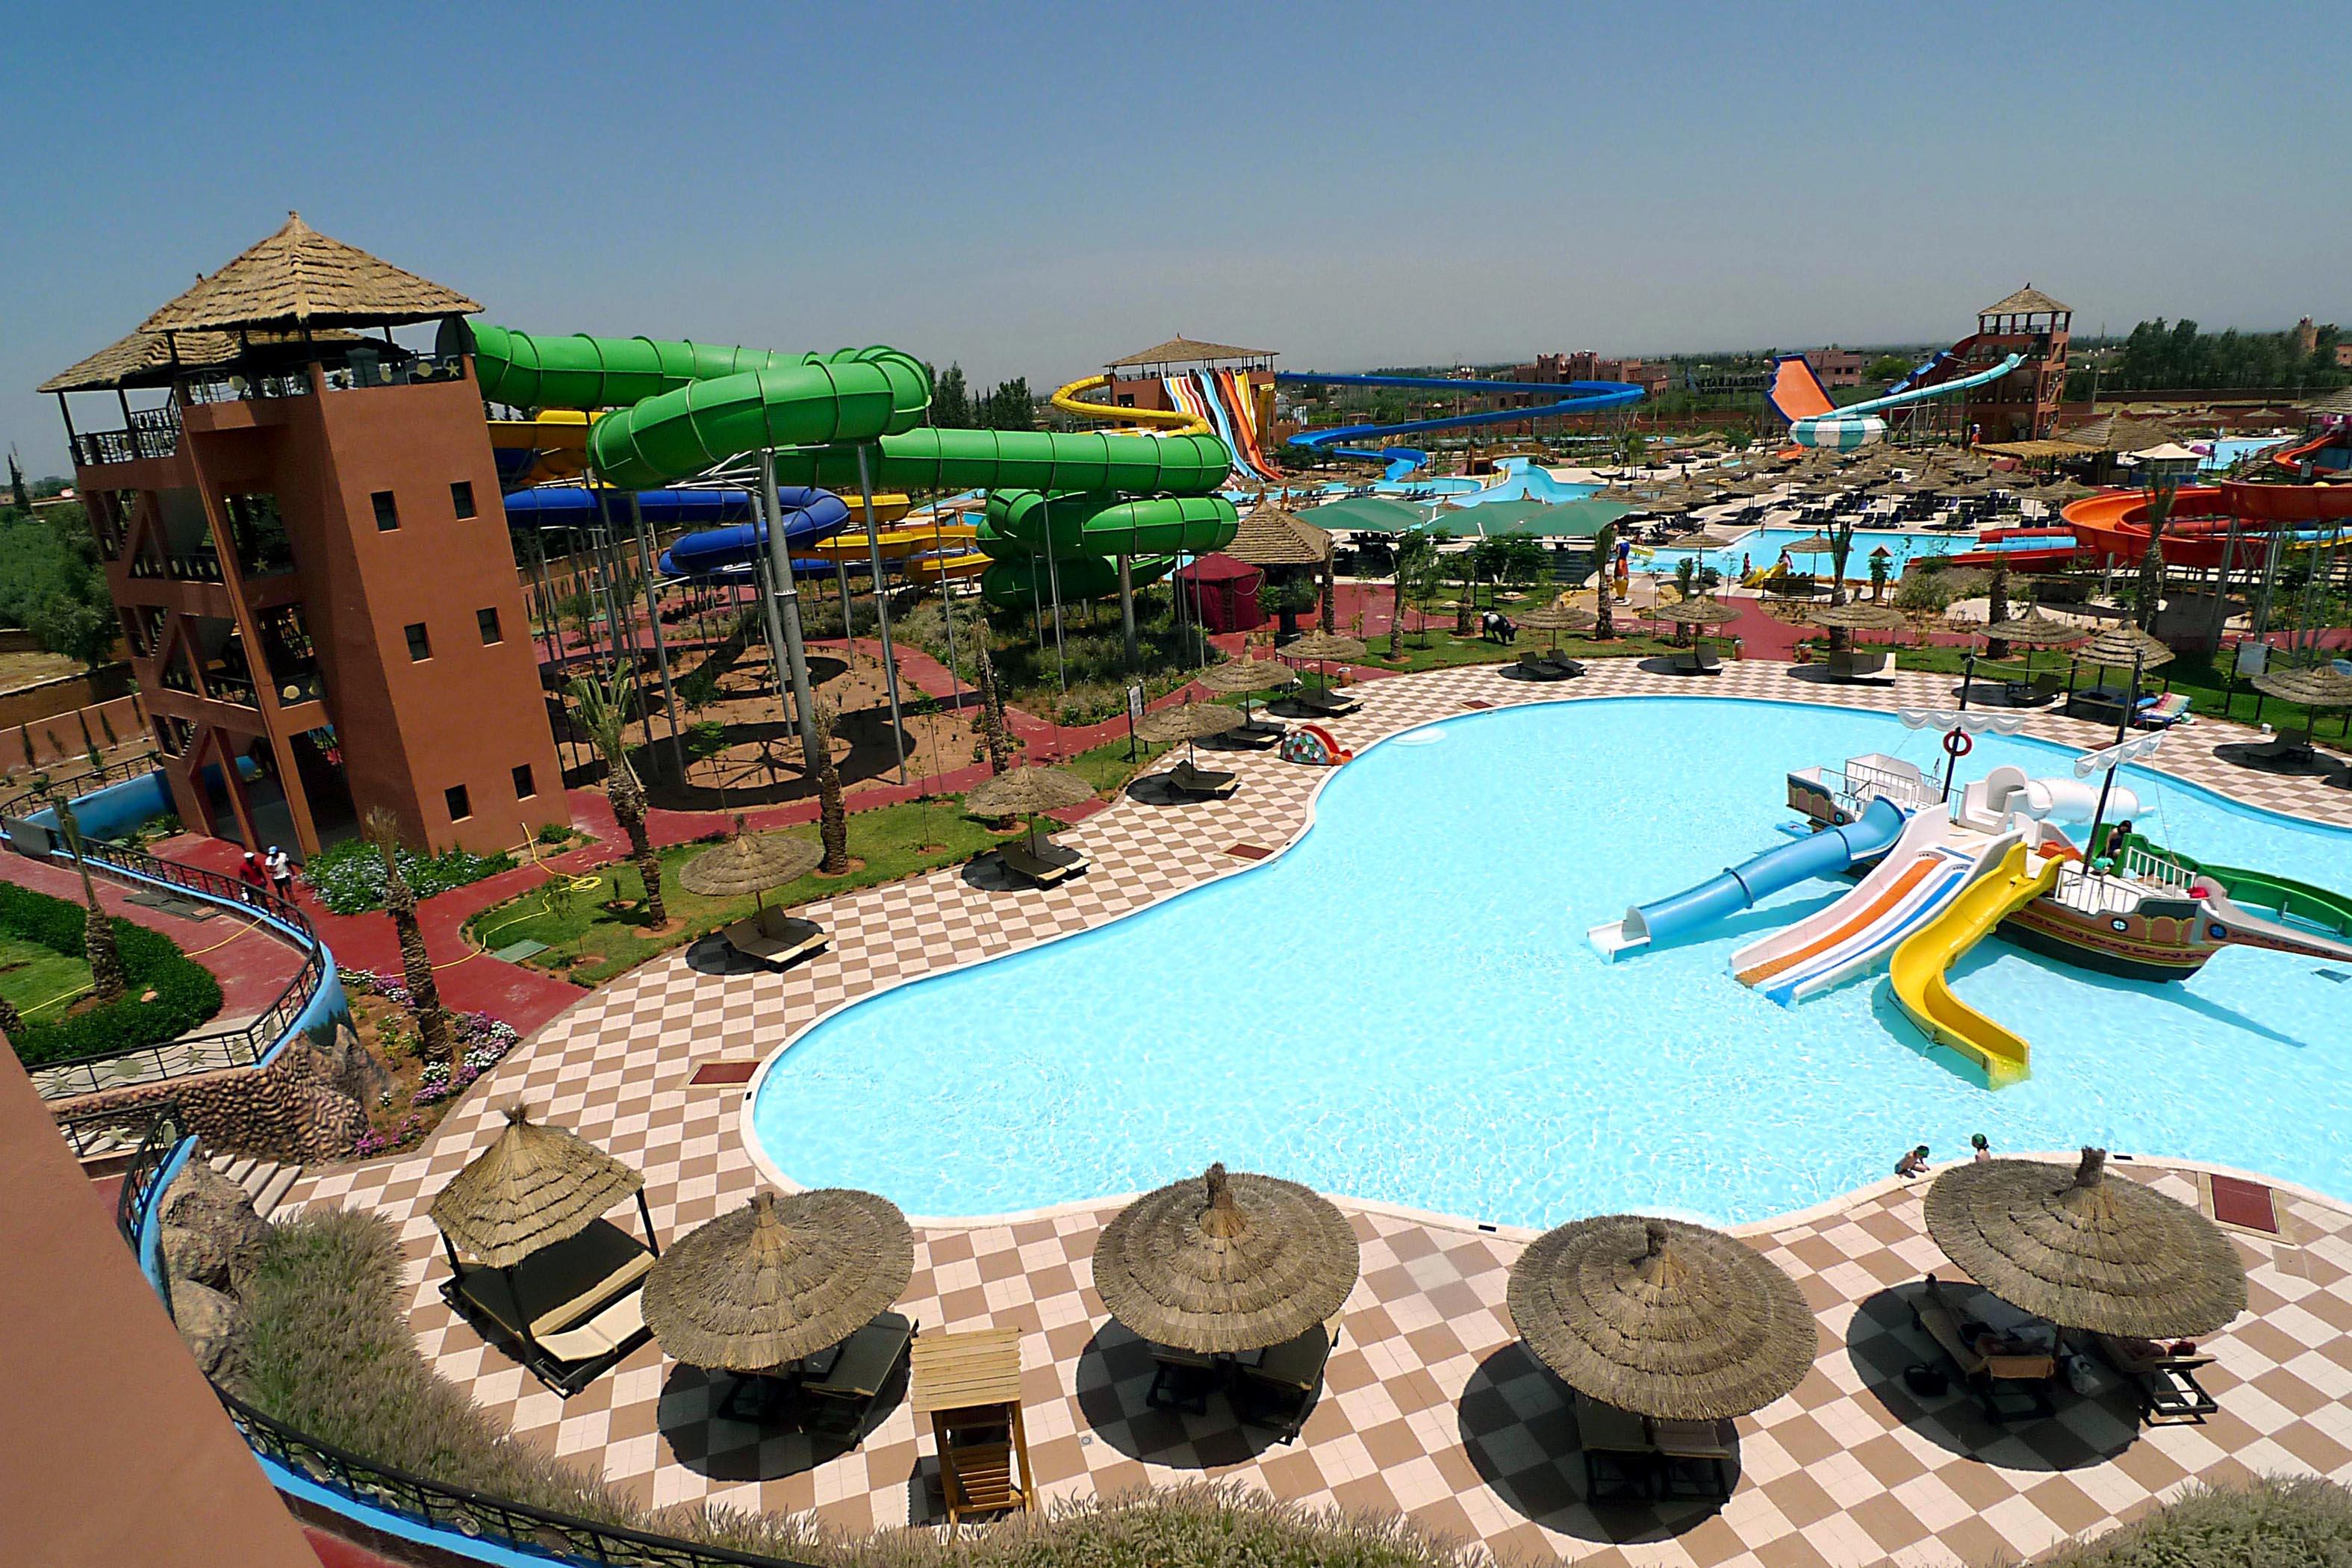 Promo aqua fun park marrakech 2014 petites annonces for Club rabat piscine